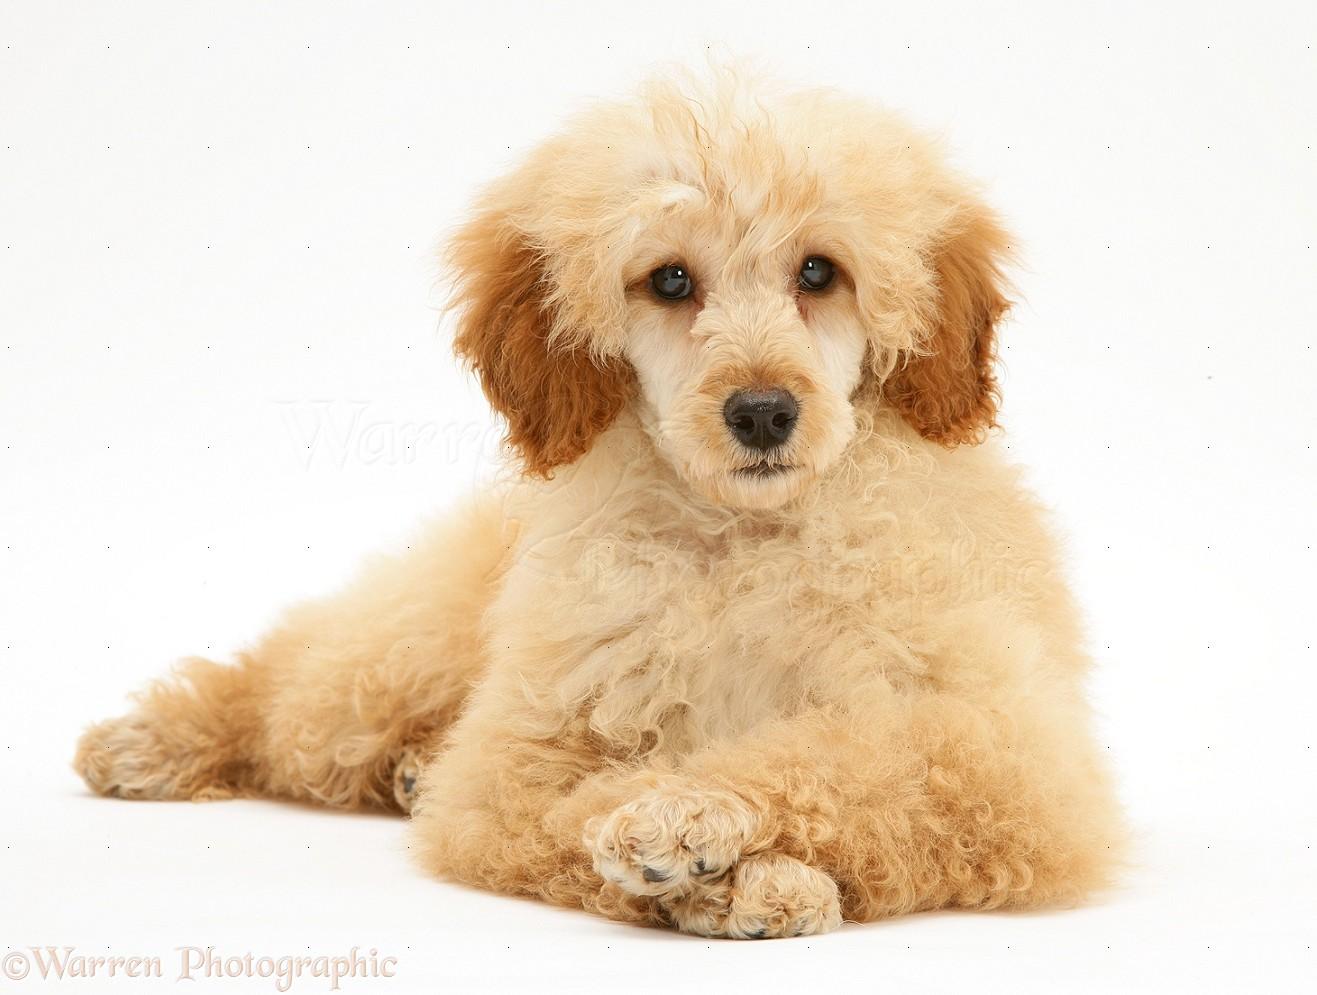 Dog Apricot Miniature Poodle Photo Wp39479